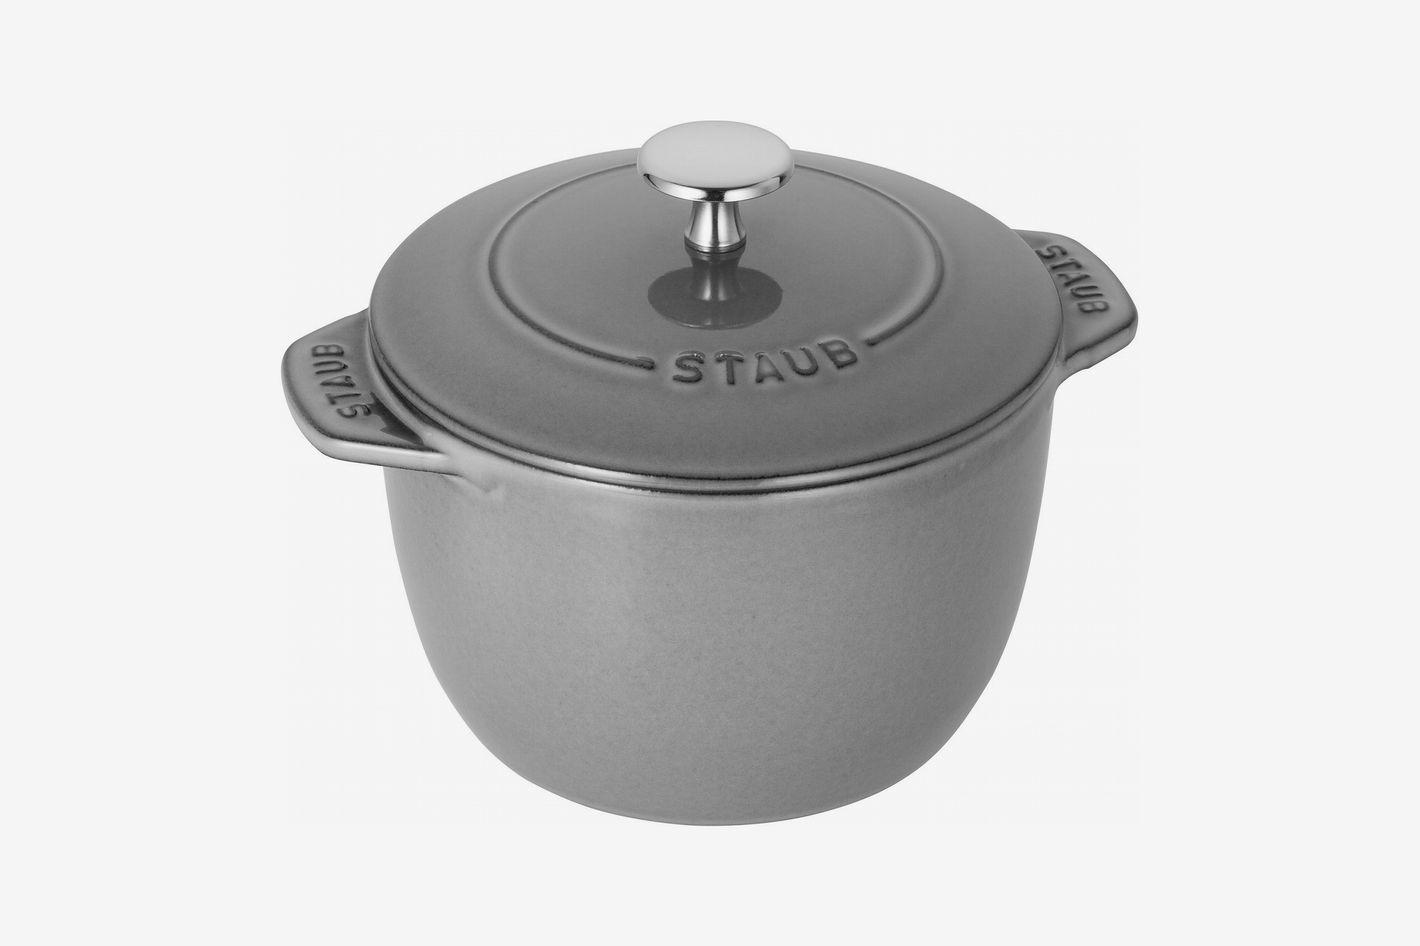 Staub Cast-Iron 1.5-Quart Petite French Oven